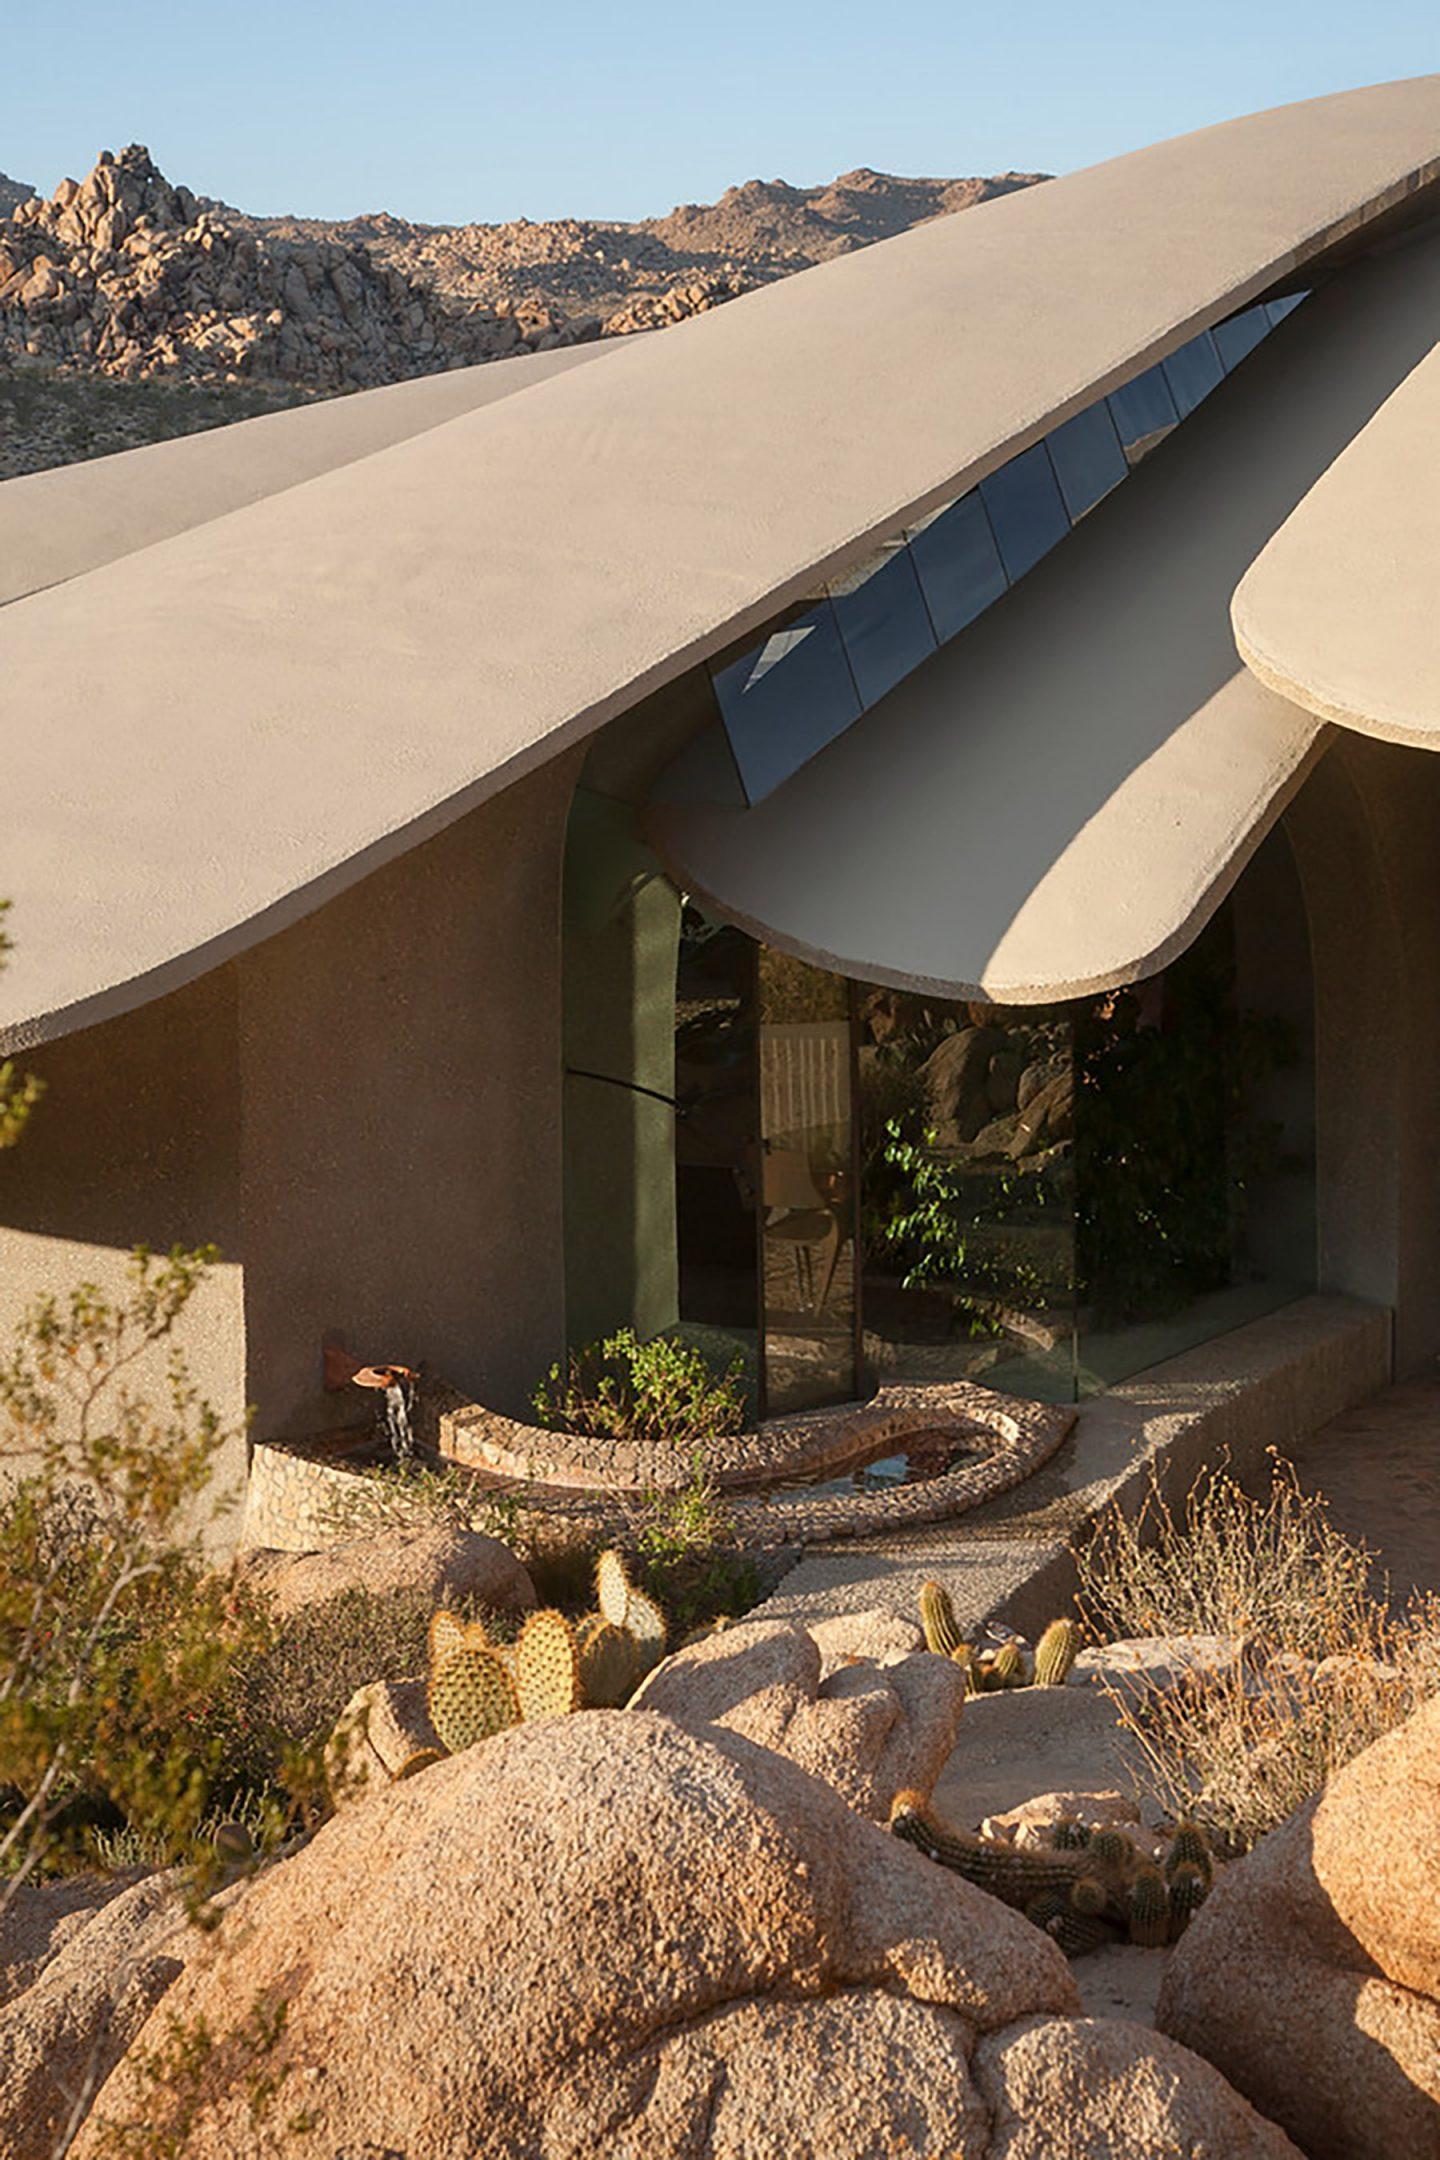 IGNANT-Architecture-Kendrick-Bangs-Kellog-Joshua-Tree-35